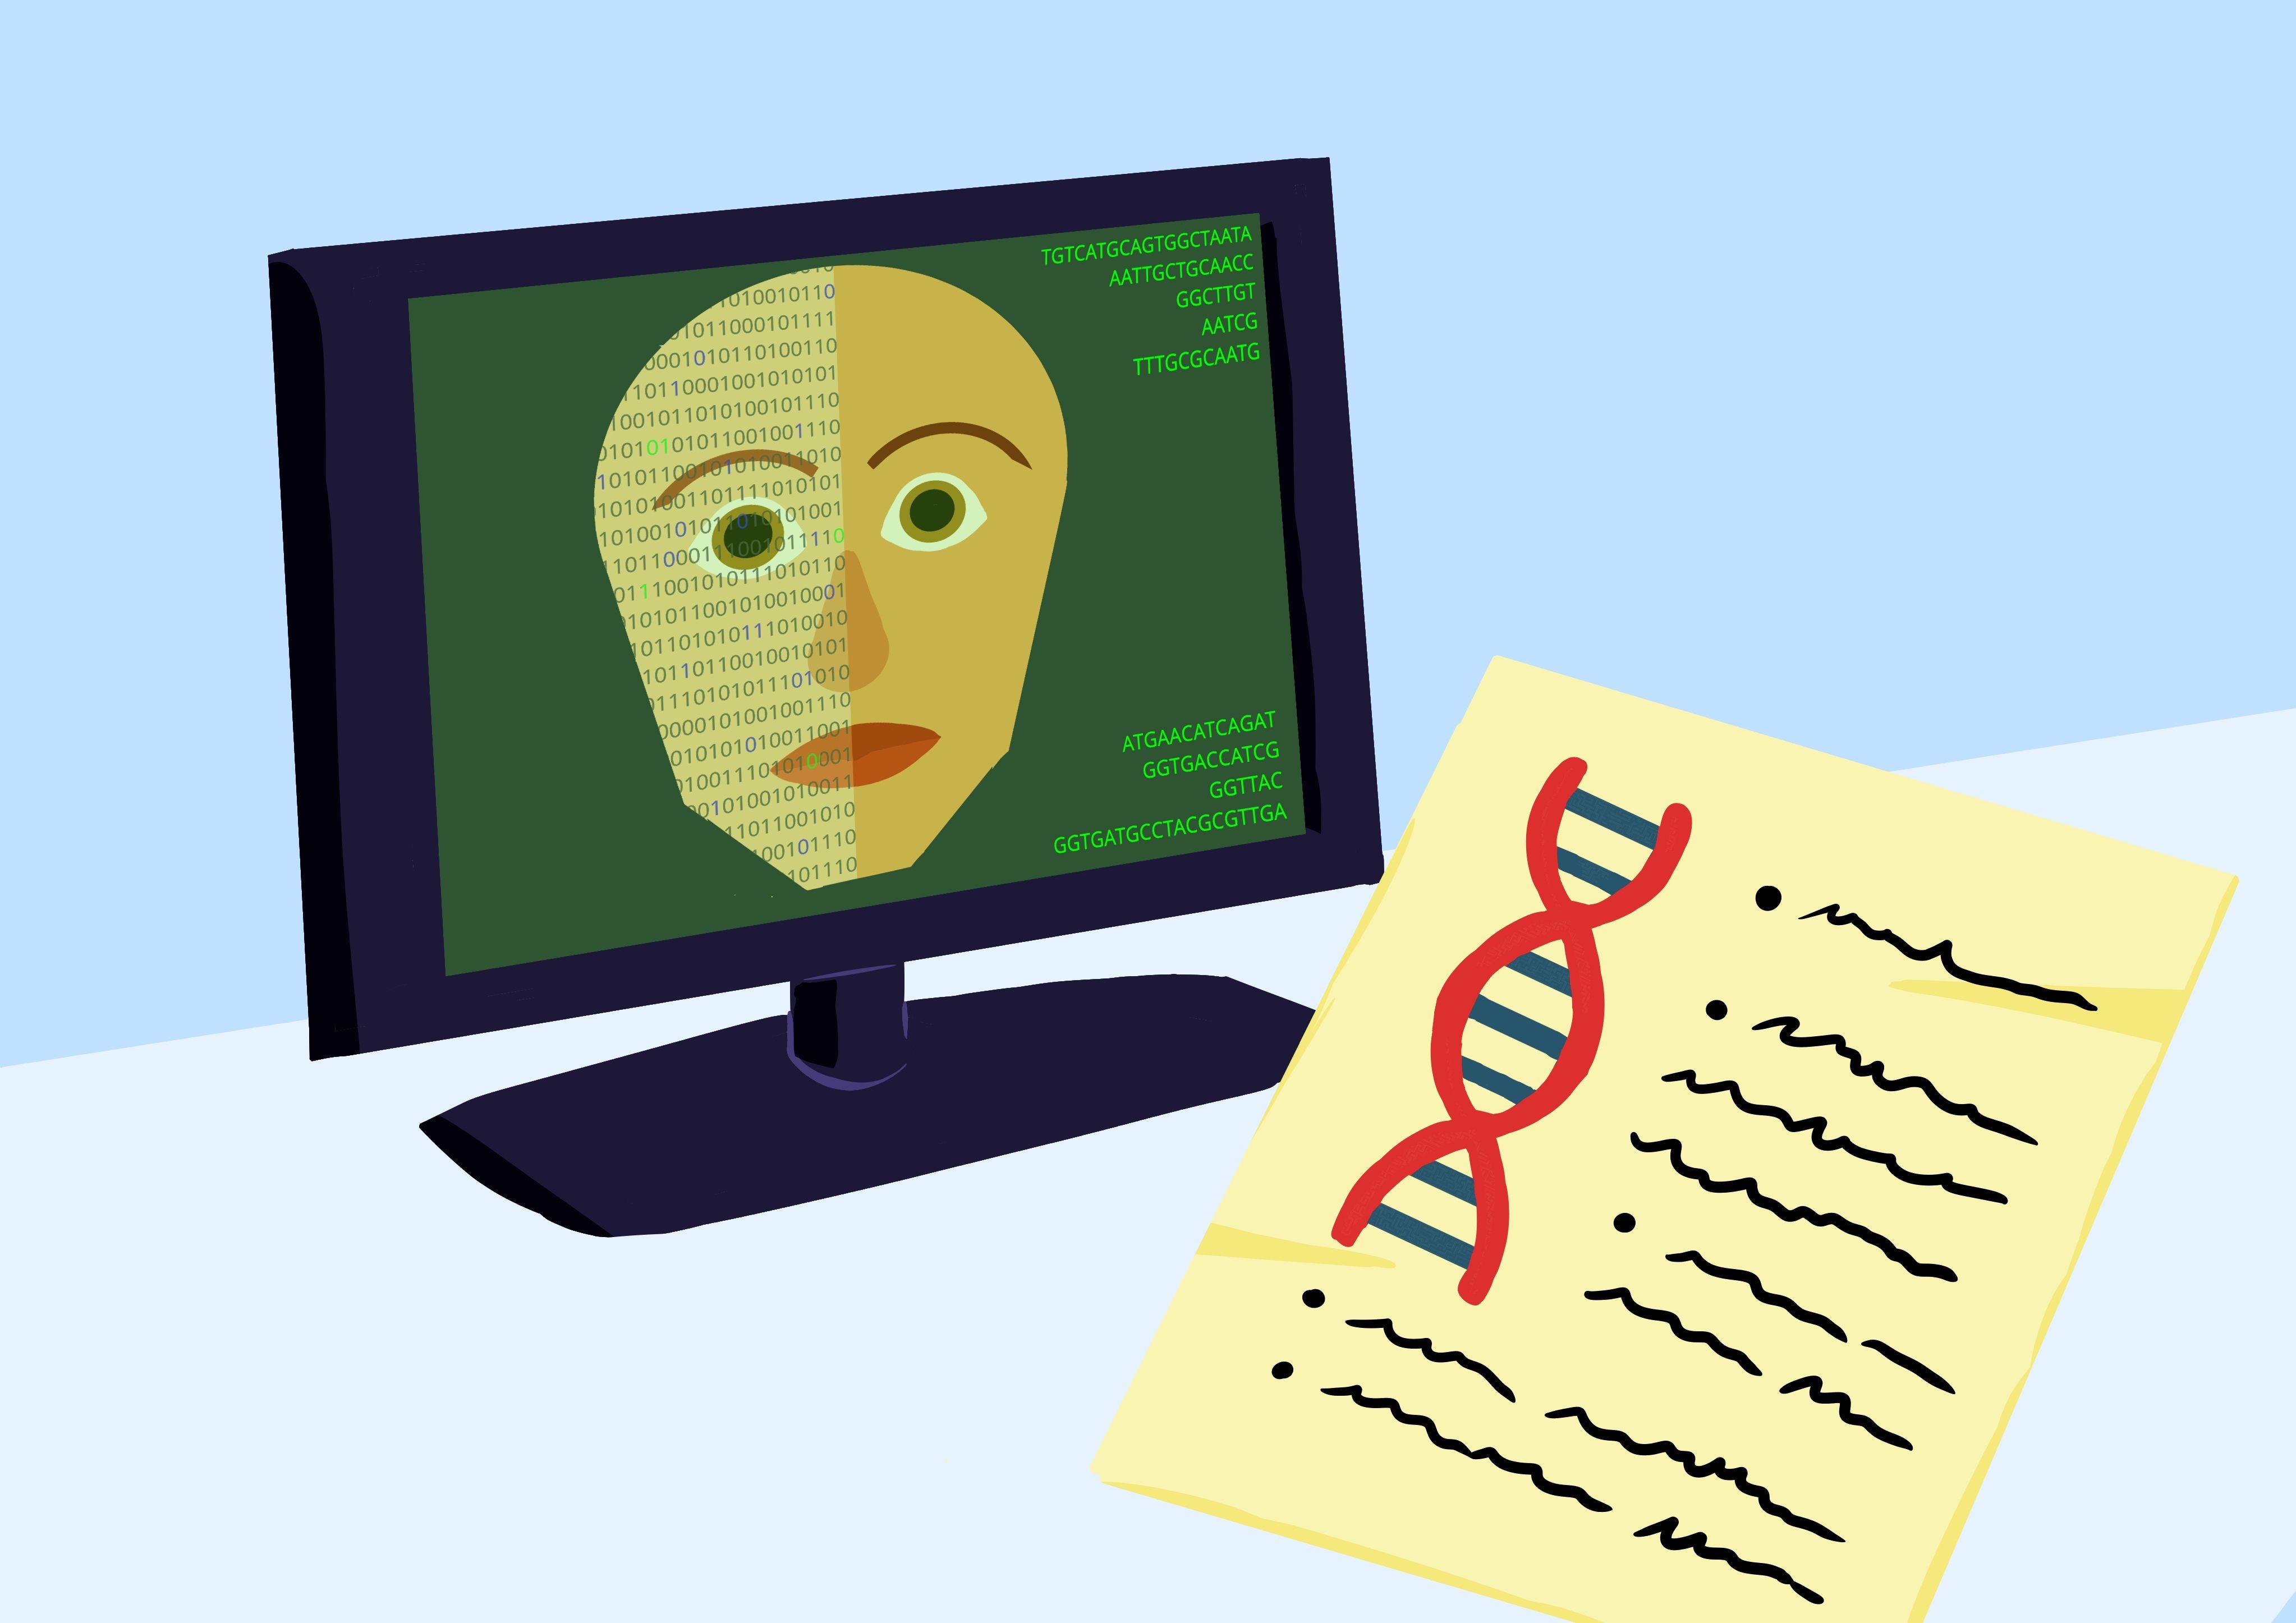 análisis genética facial